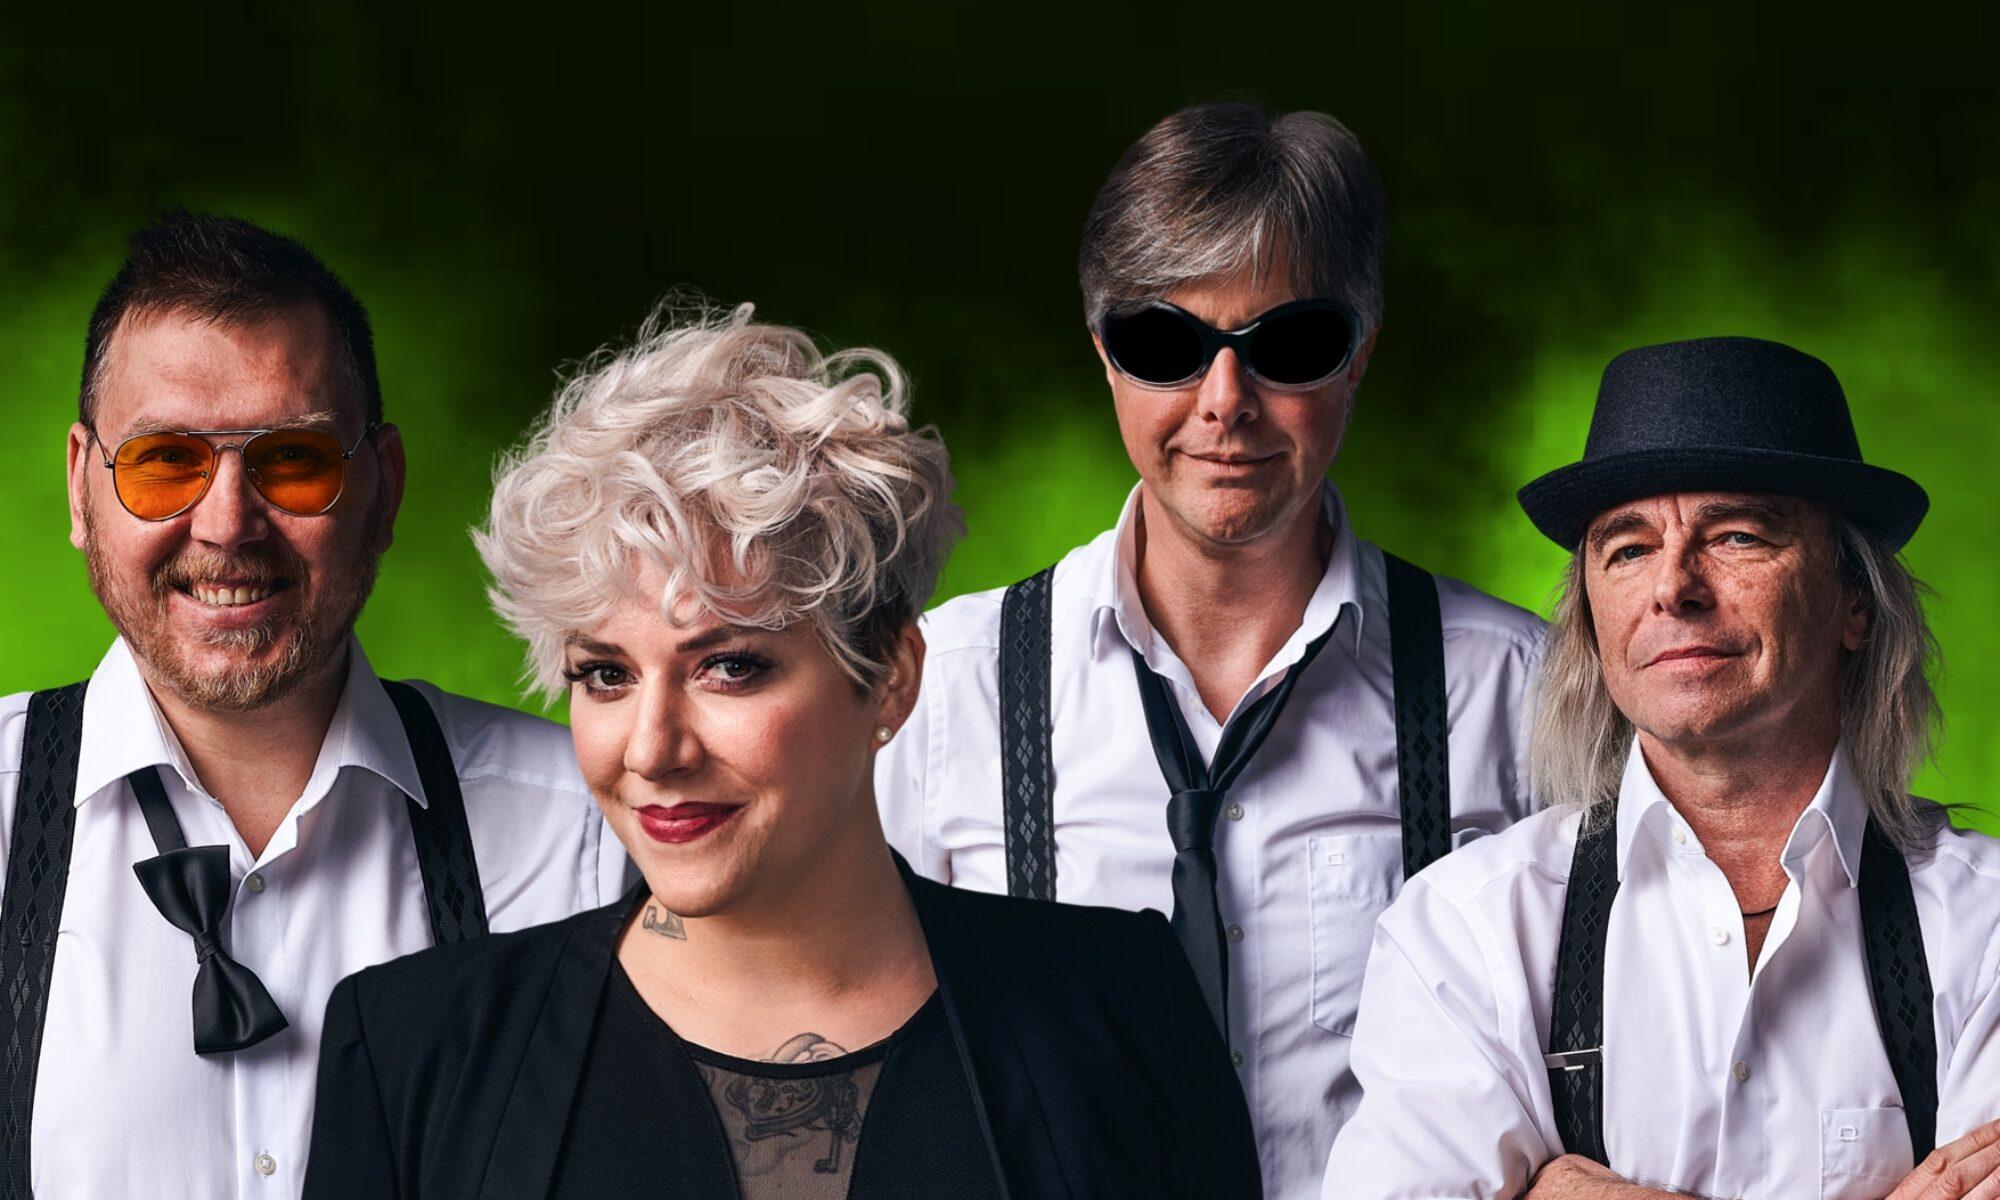 Die Kalbacher / The Hangover-Band